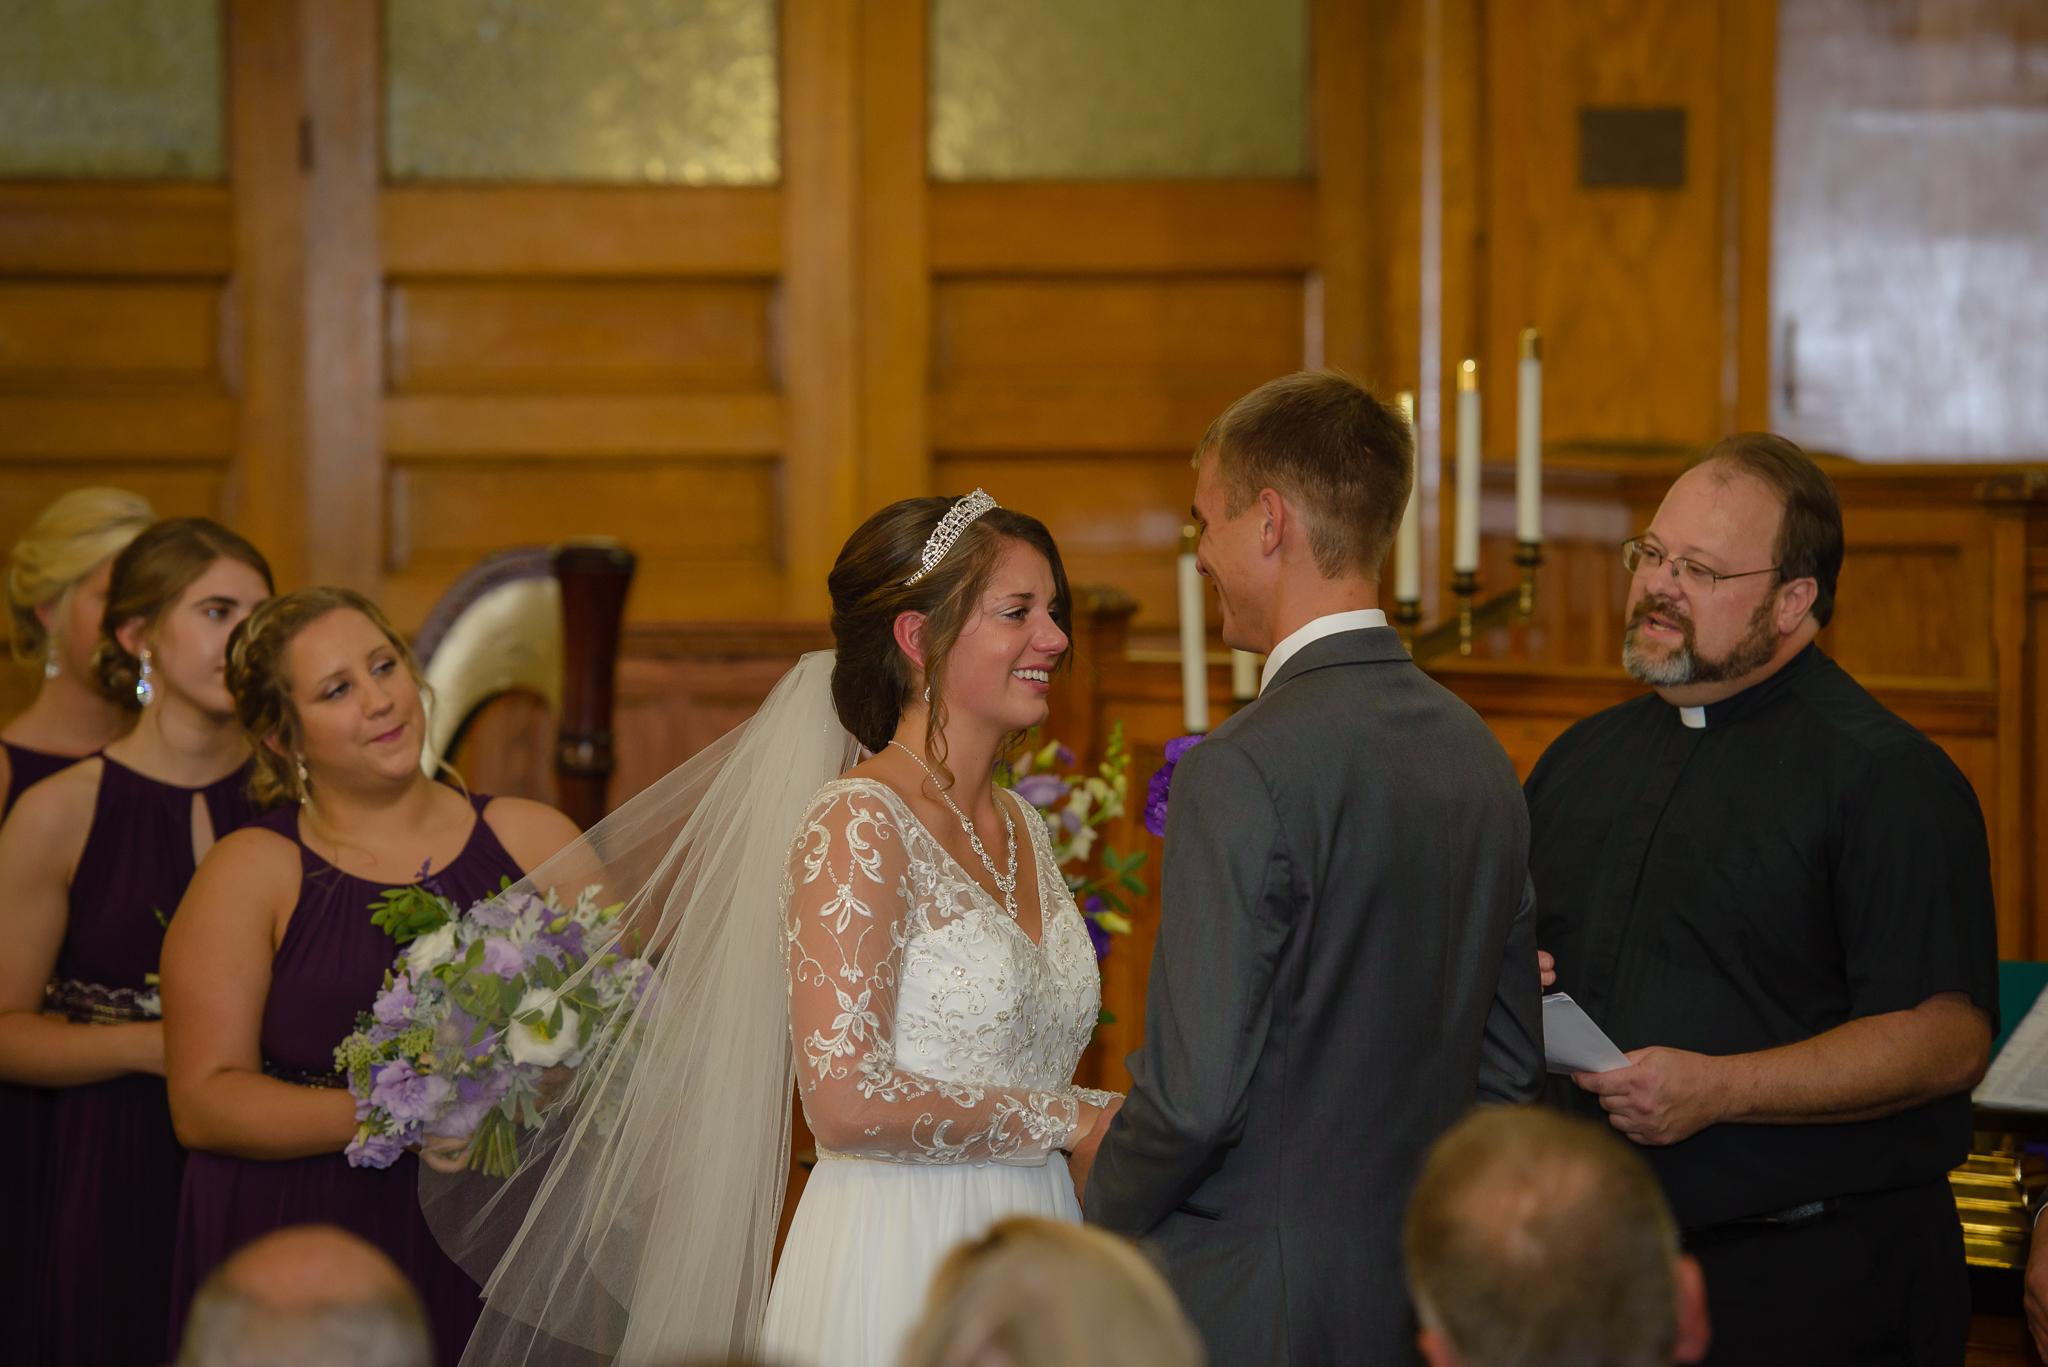 12-ashland washburn wedding photographyDSC_3706.jpg